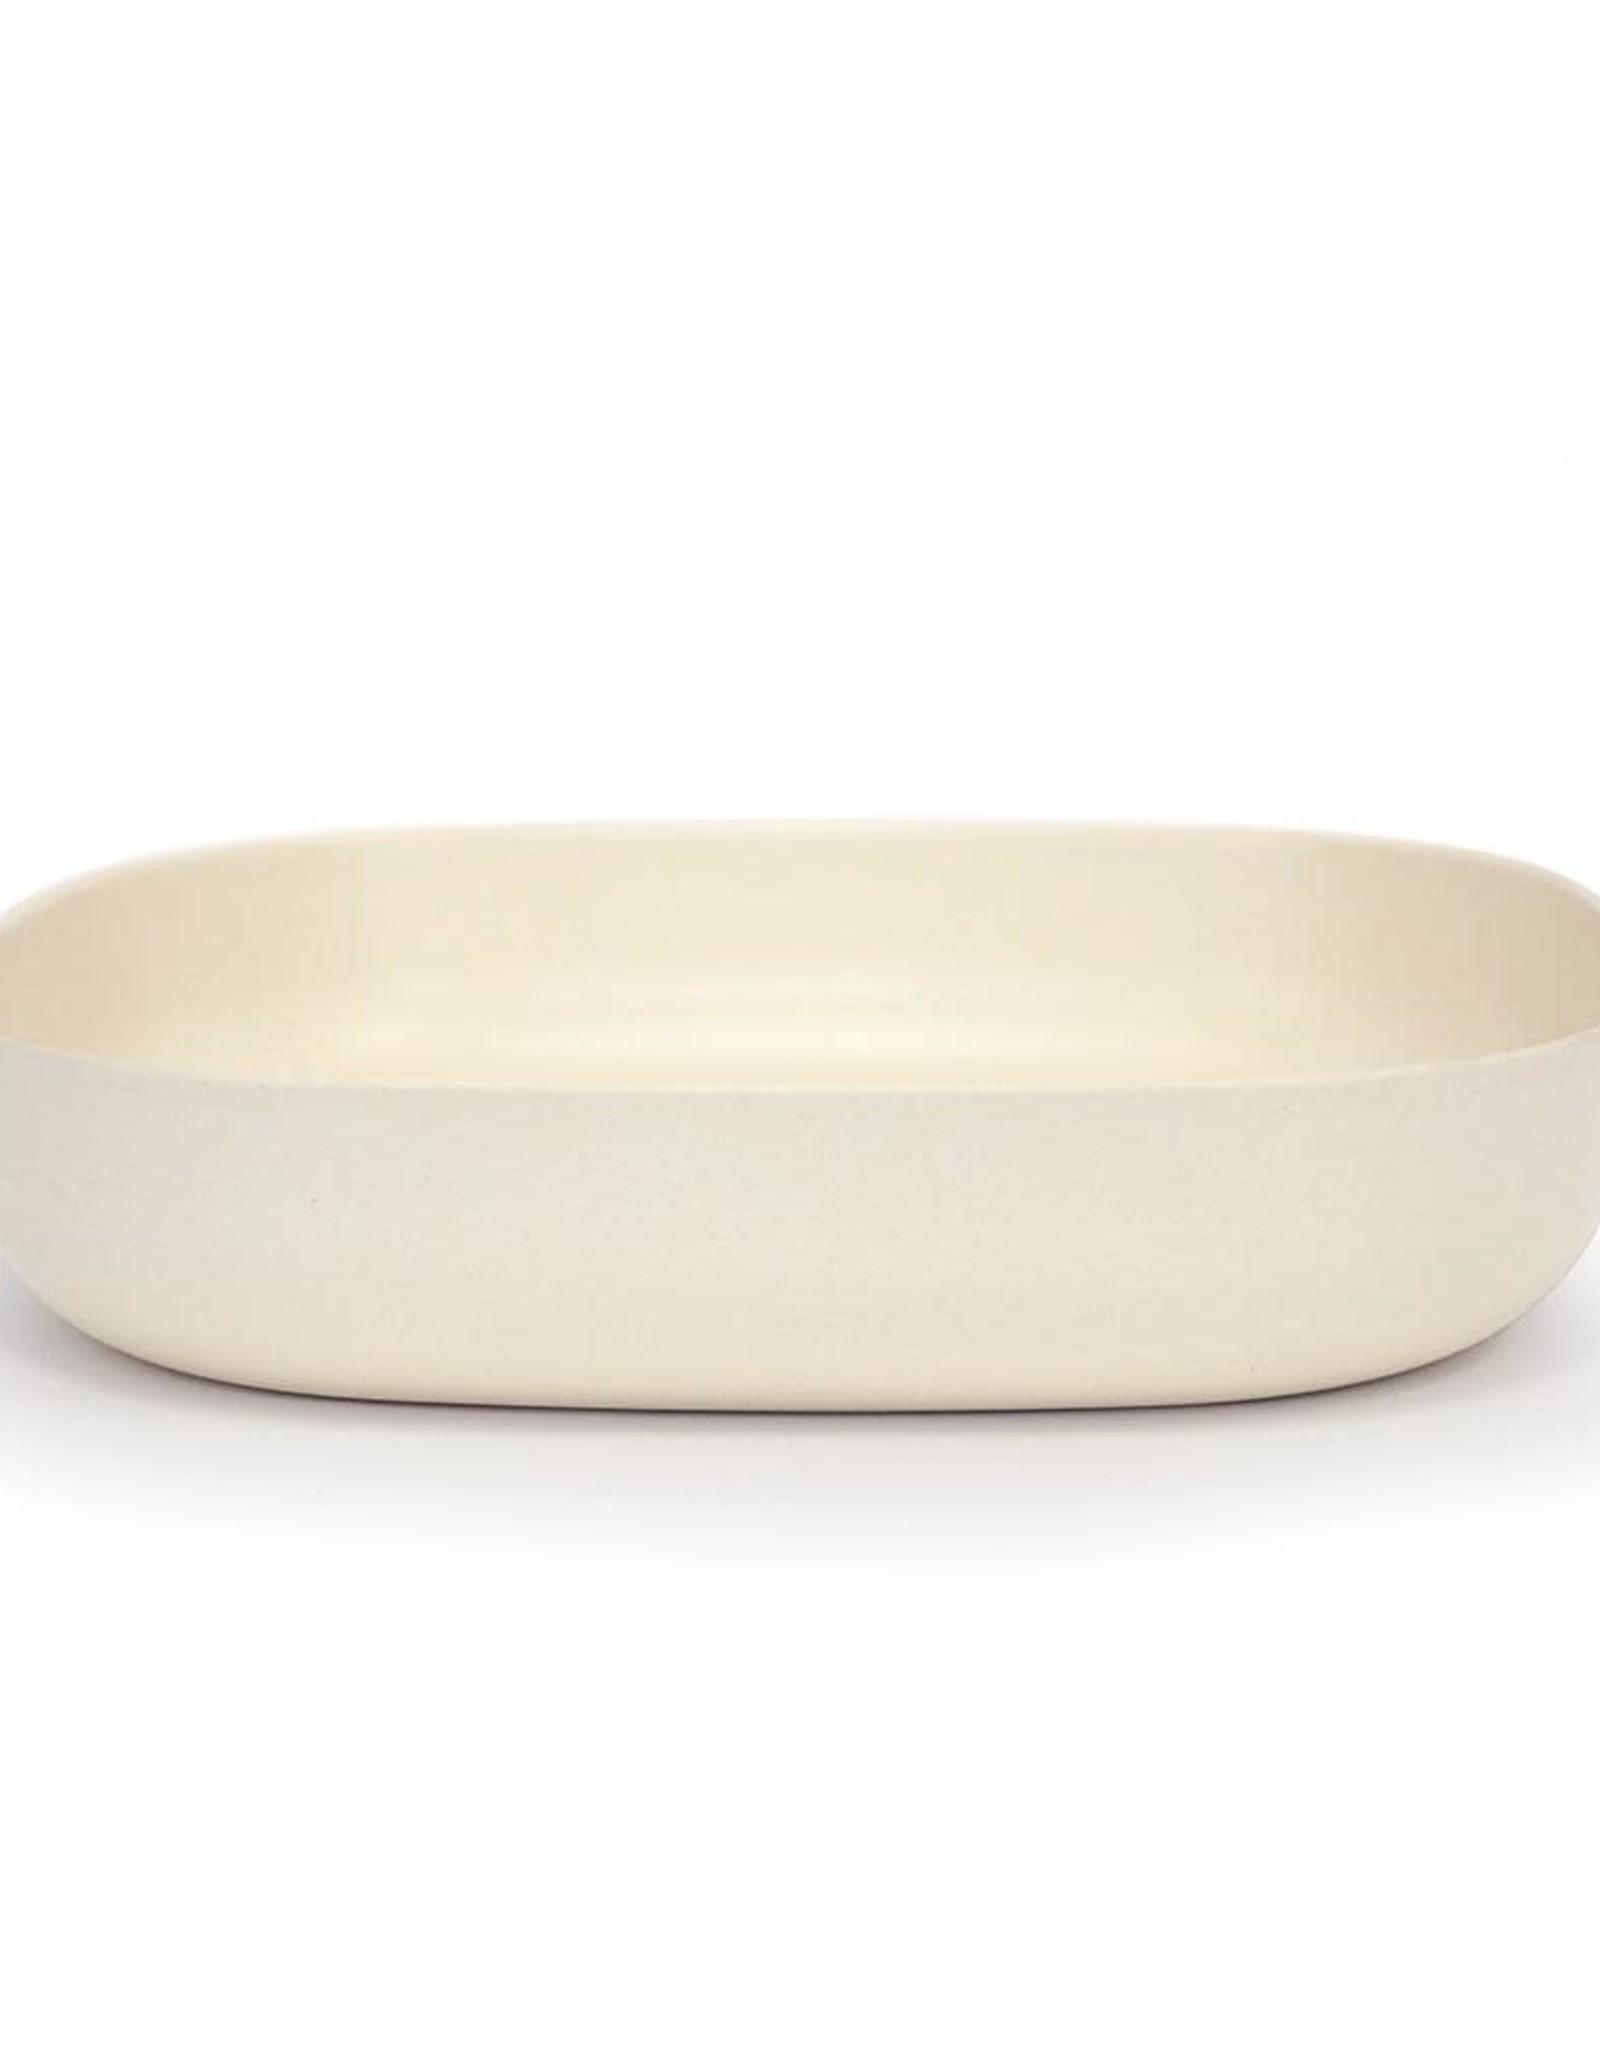 EKOBO USA Gusto 160 Large Serving Dish